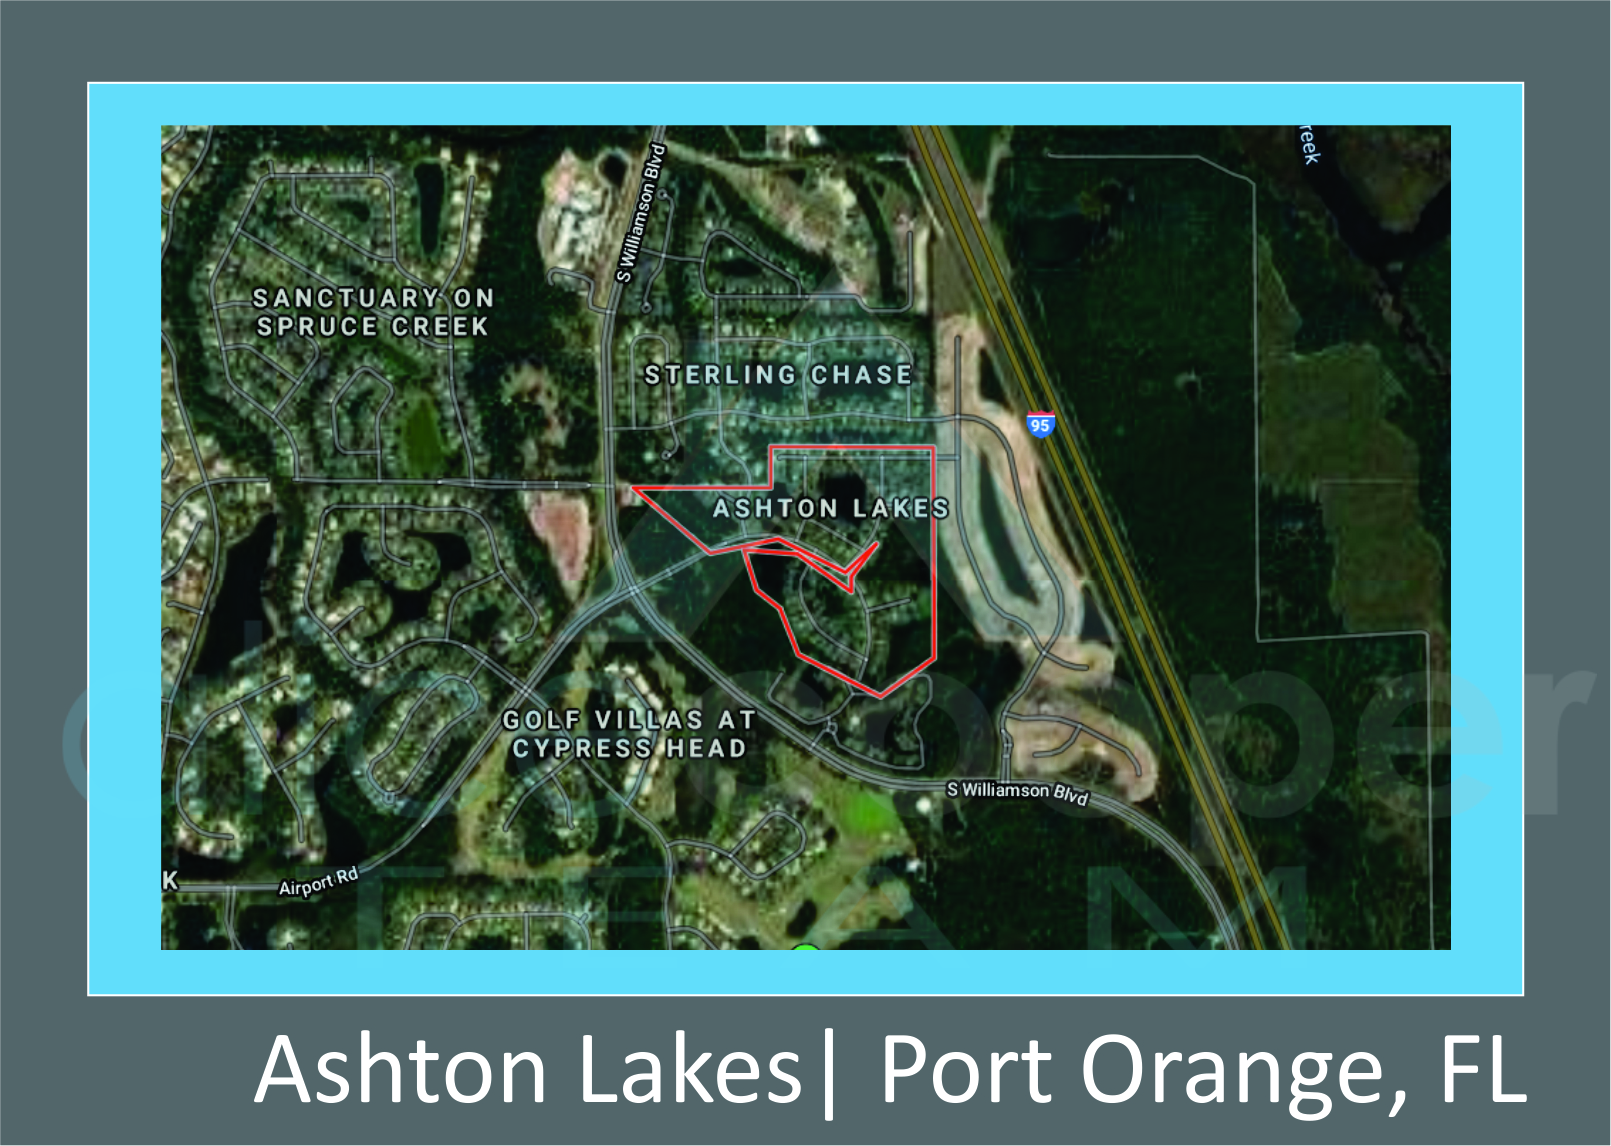 Map of Ashton Lakes, Port Orange, FL